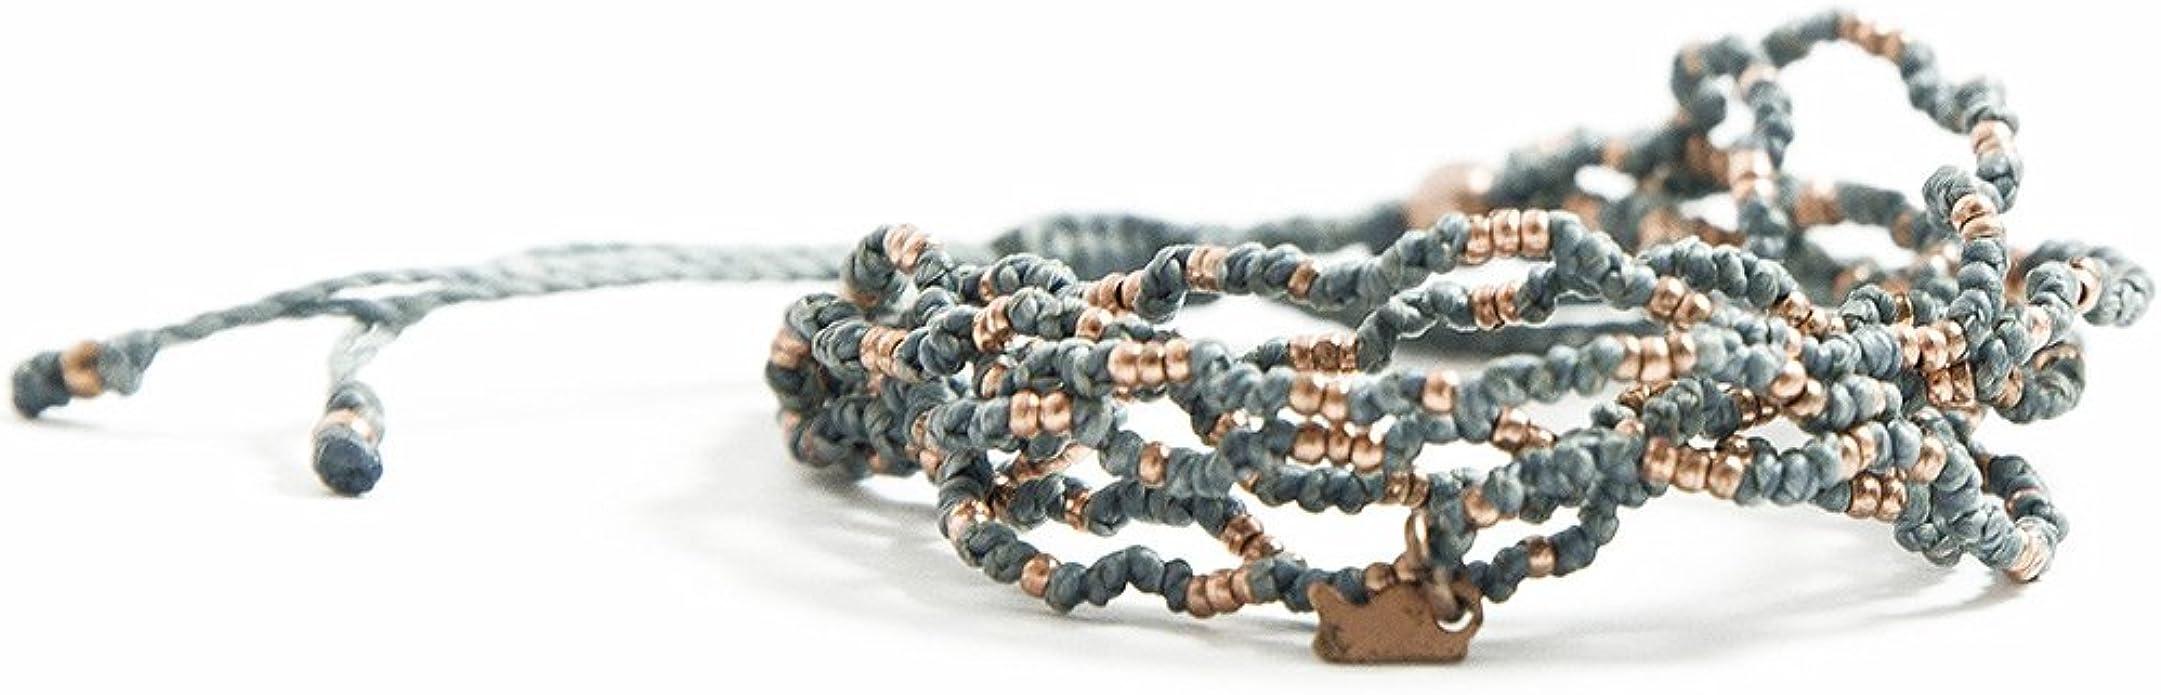 Adjustable Band Wild Midnight By Mabuhay Bracelets\u00ae Bright Bracelet 100/% Waterproof and Handmade wCoated Charm